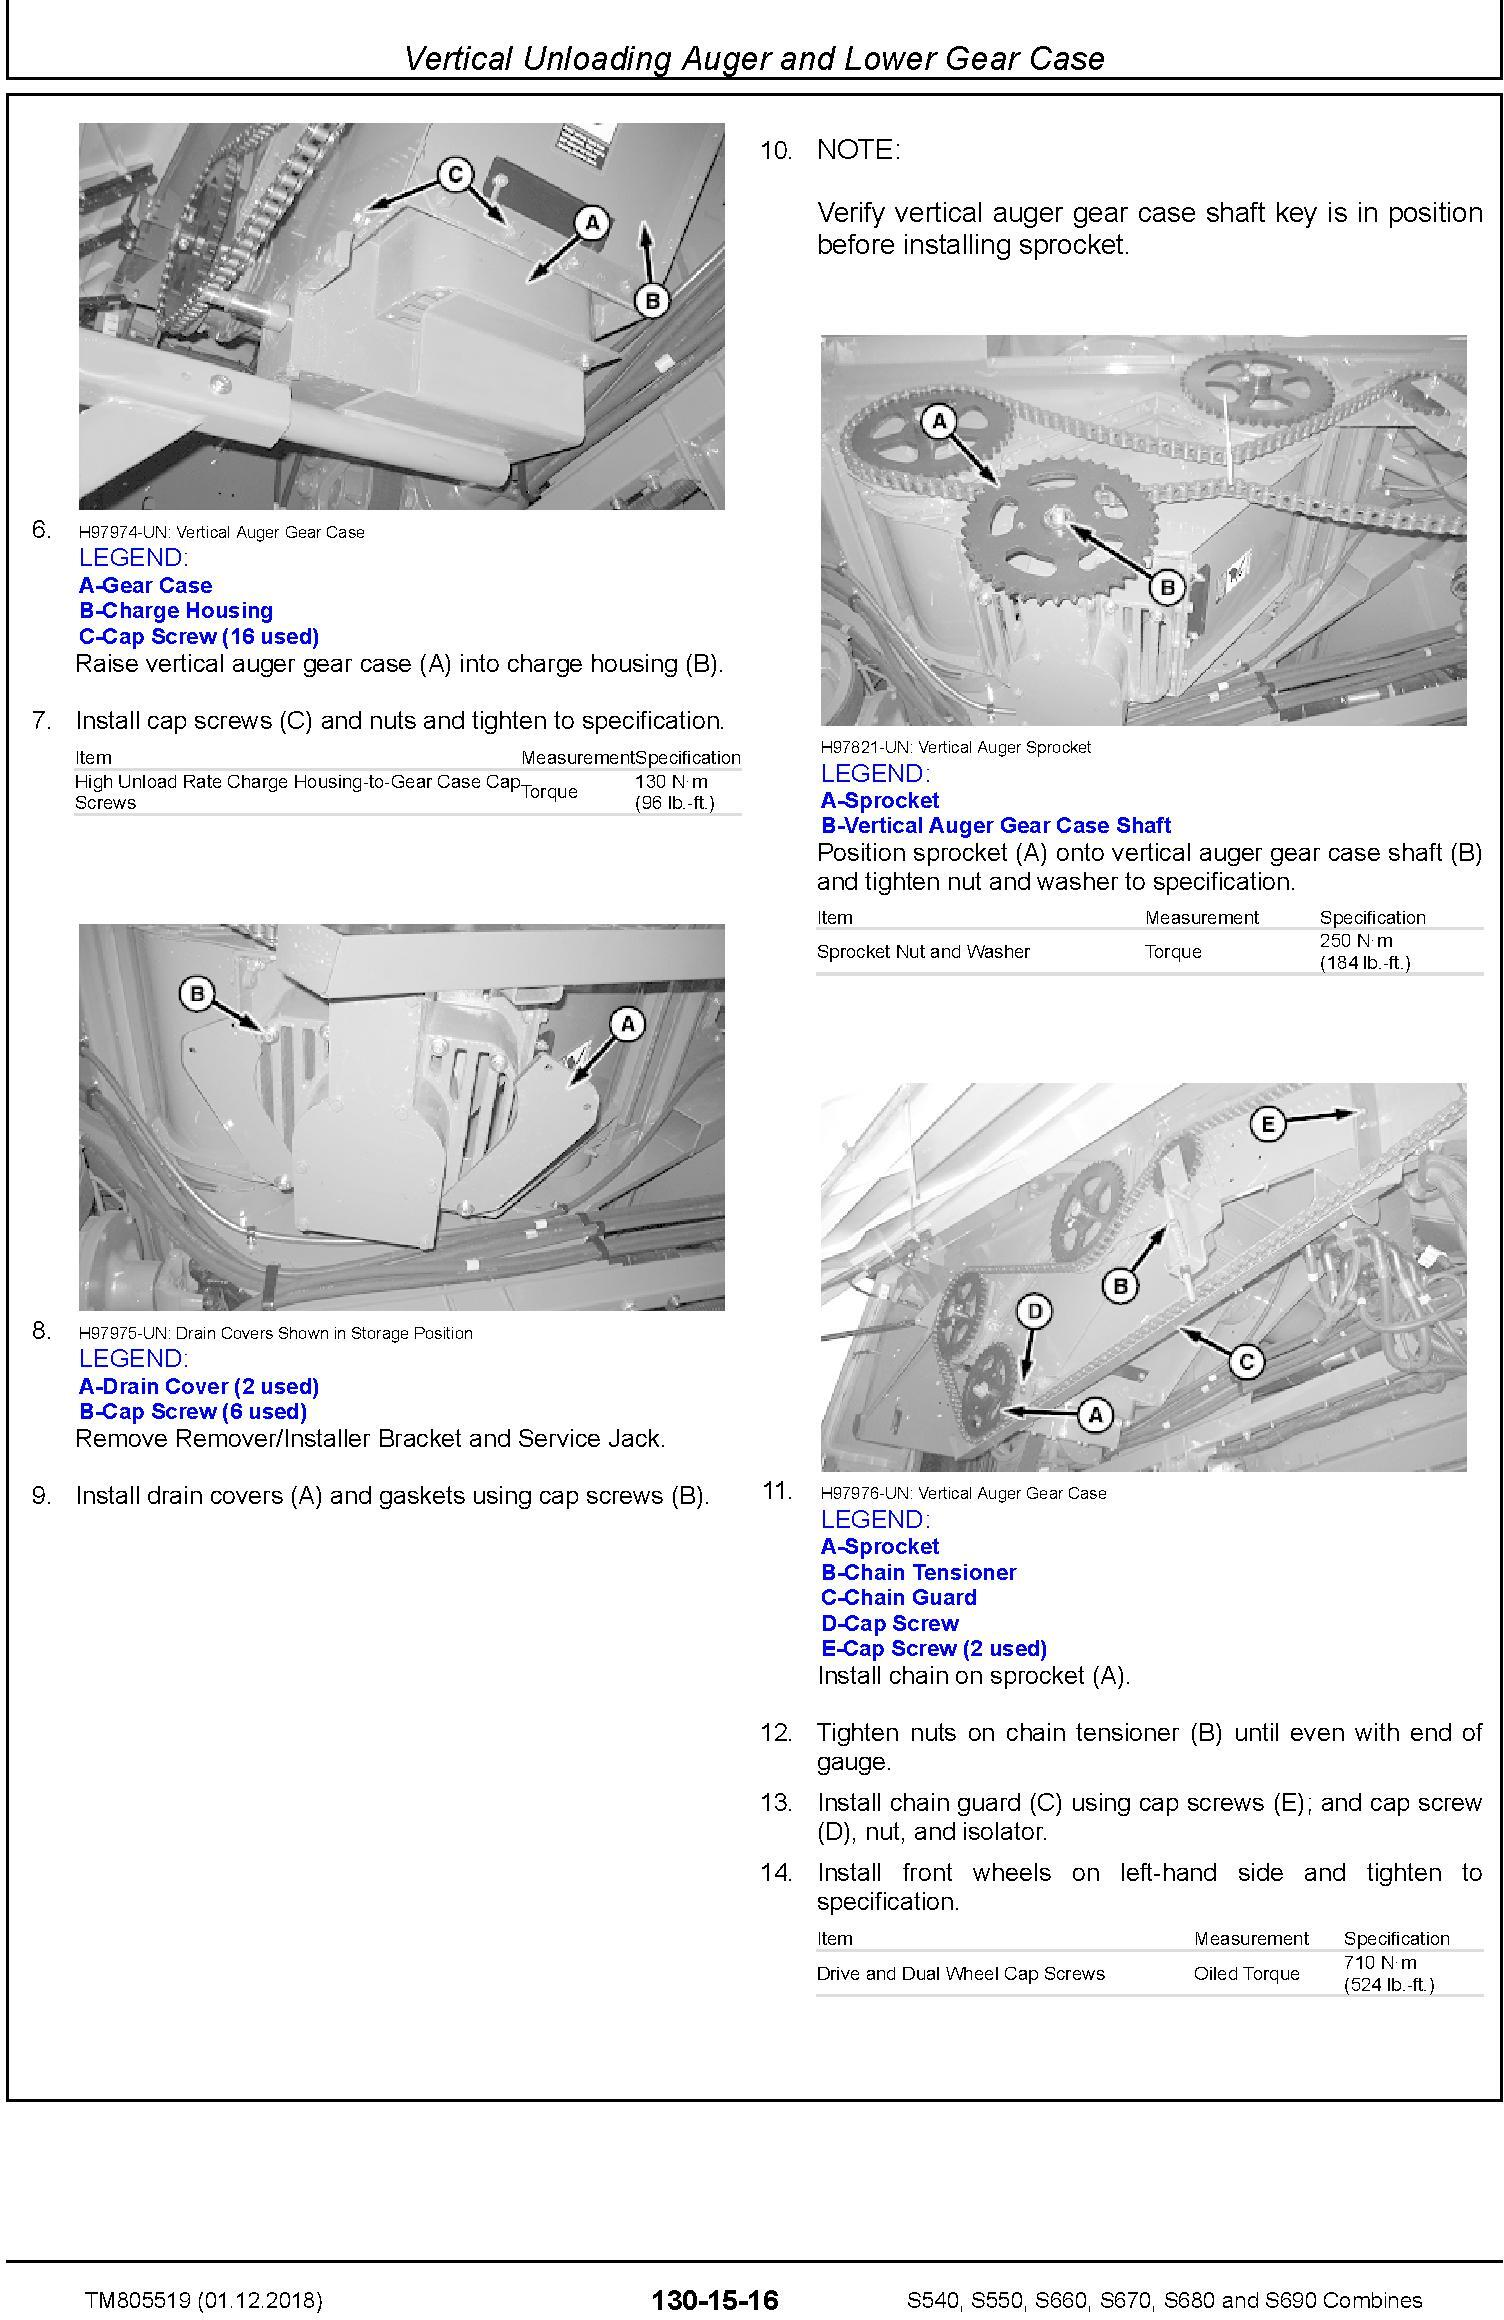 John Deere S540, S550, S660, S670, S680, S690 Combines (SN.120100-) Repair Technical Manual TM805519 - 2